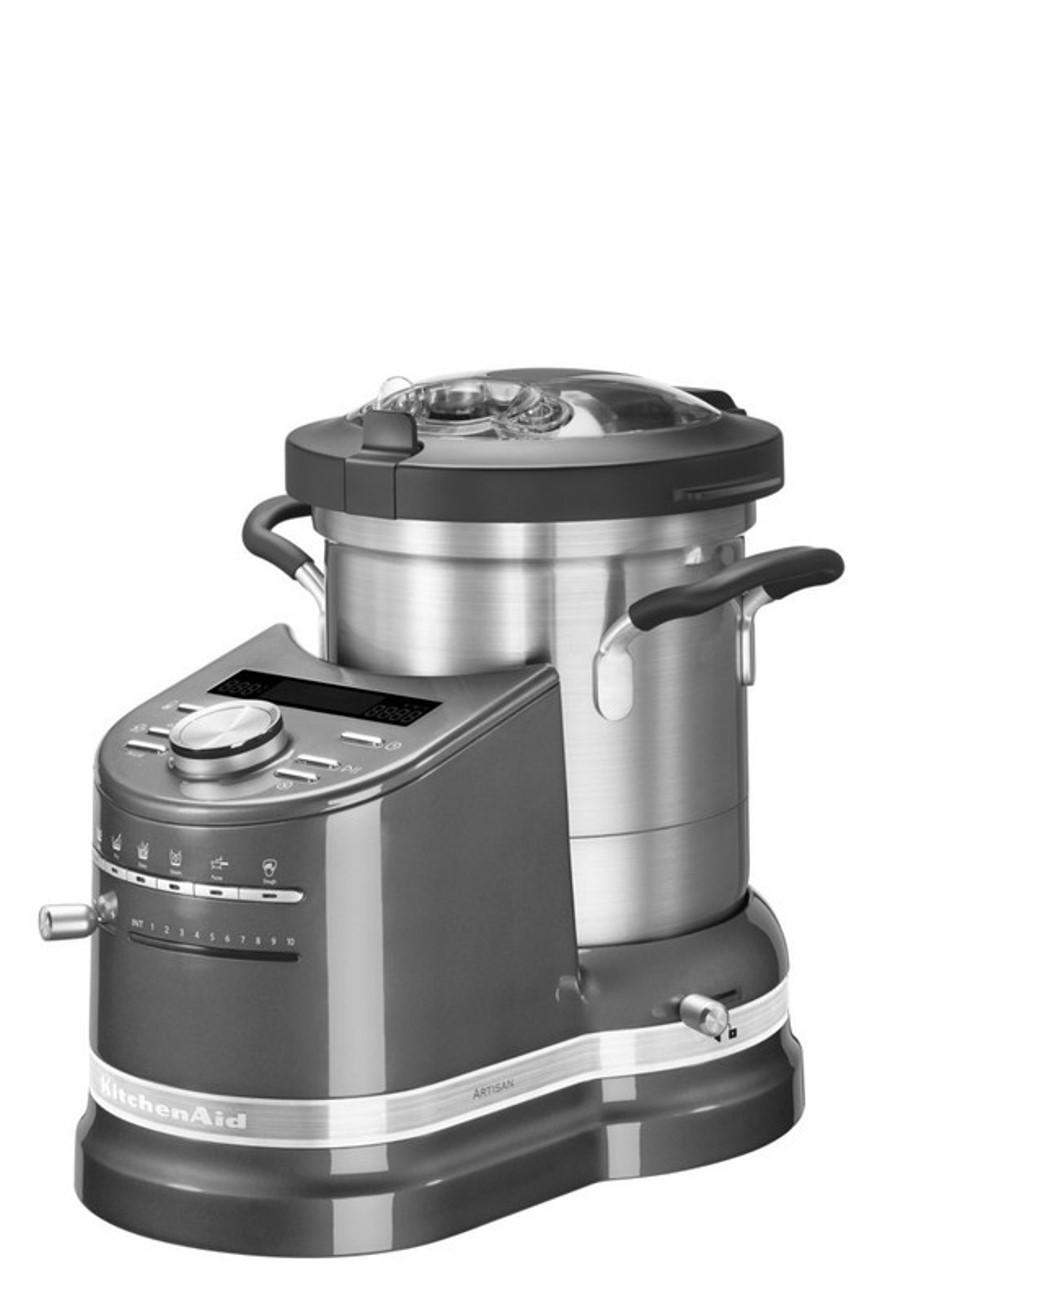 Онлайн каталог PROMENU: Кулинарный процессор KitchenAid Artisan, объем 4,5 л, серый                                   5KCF0103EMS